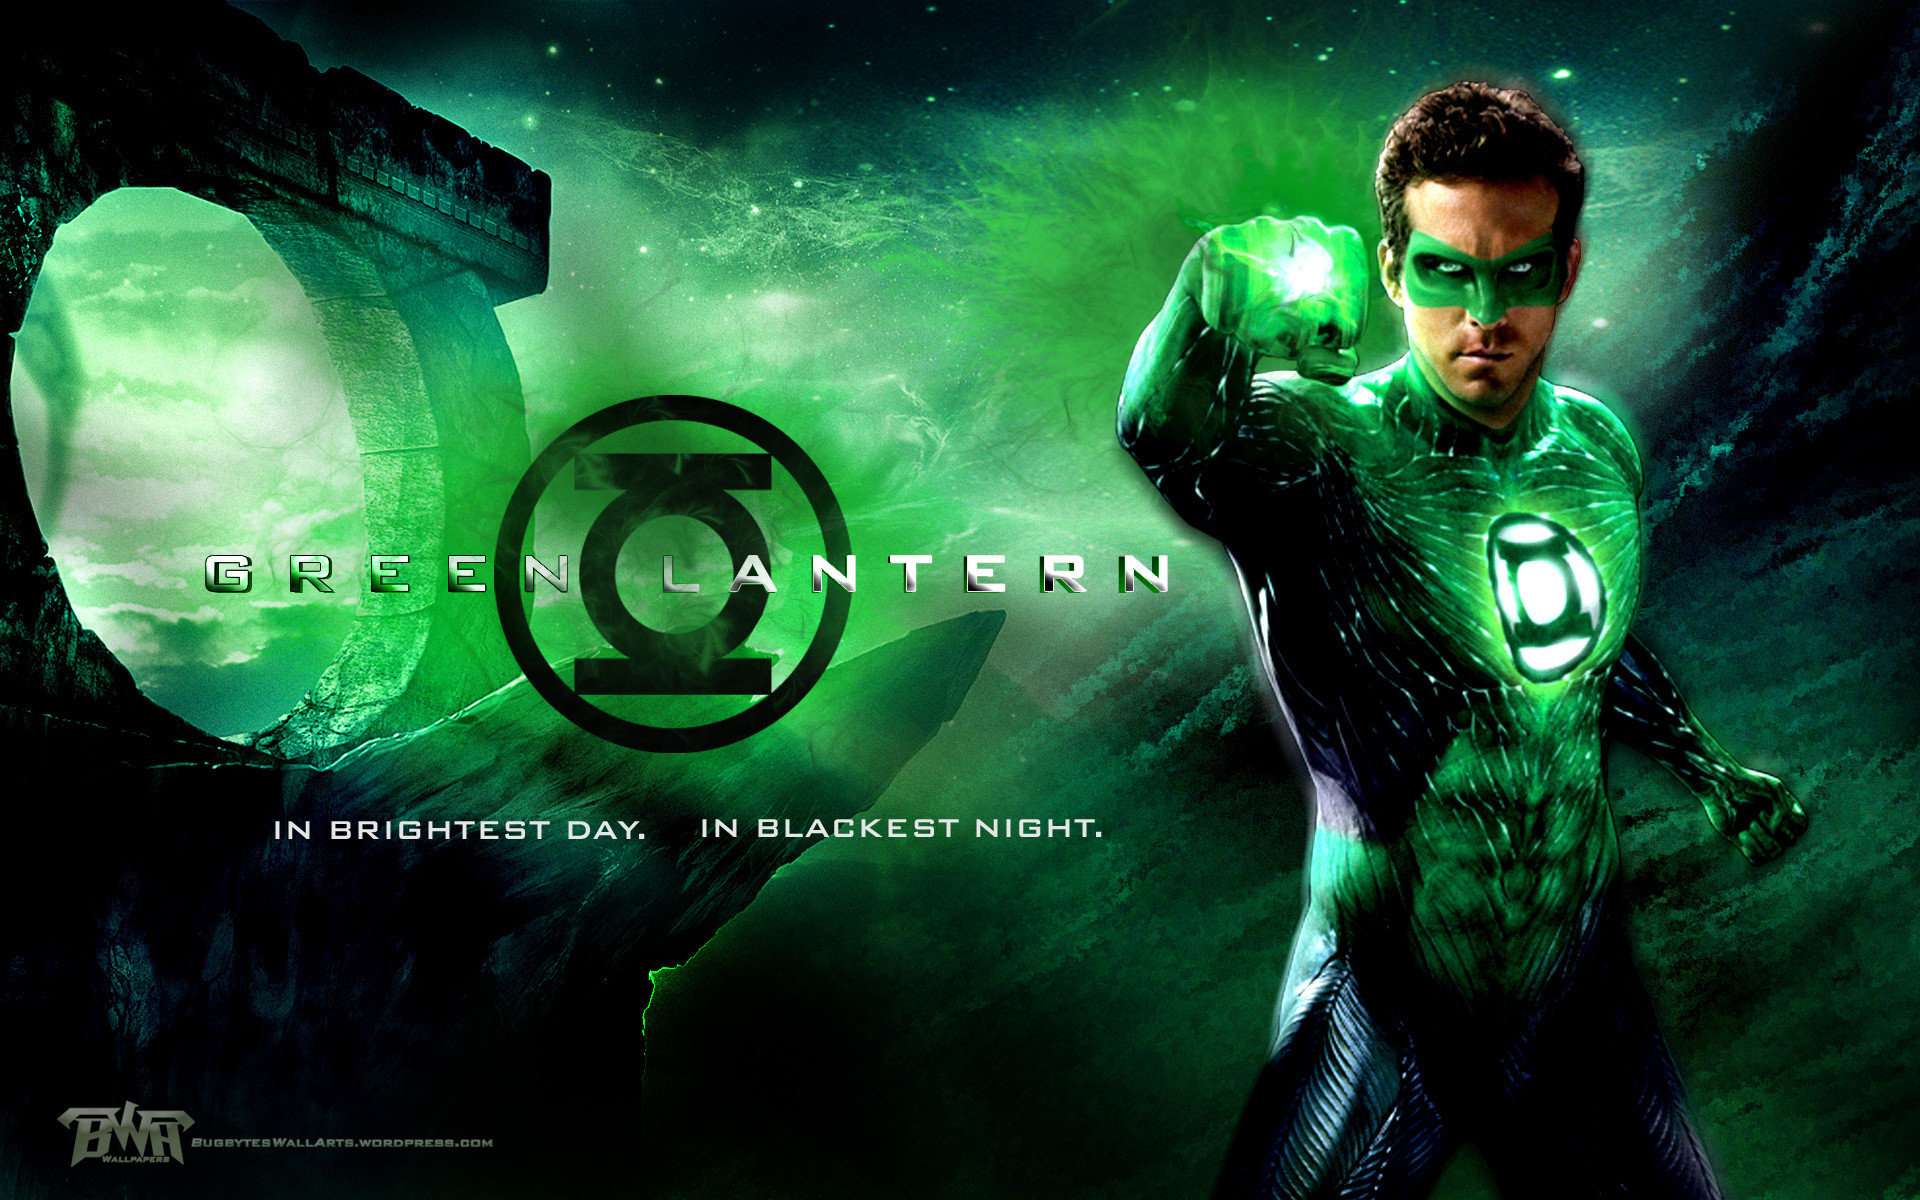 Green Lantern Movie Wallpaper 65 images 1920x1200